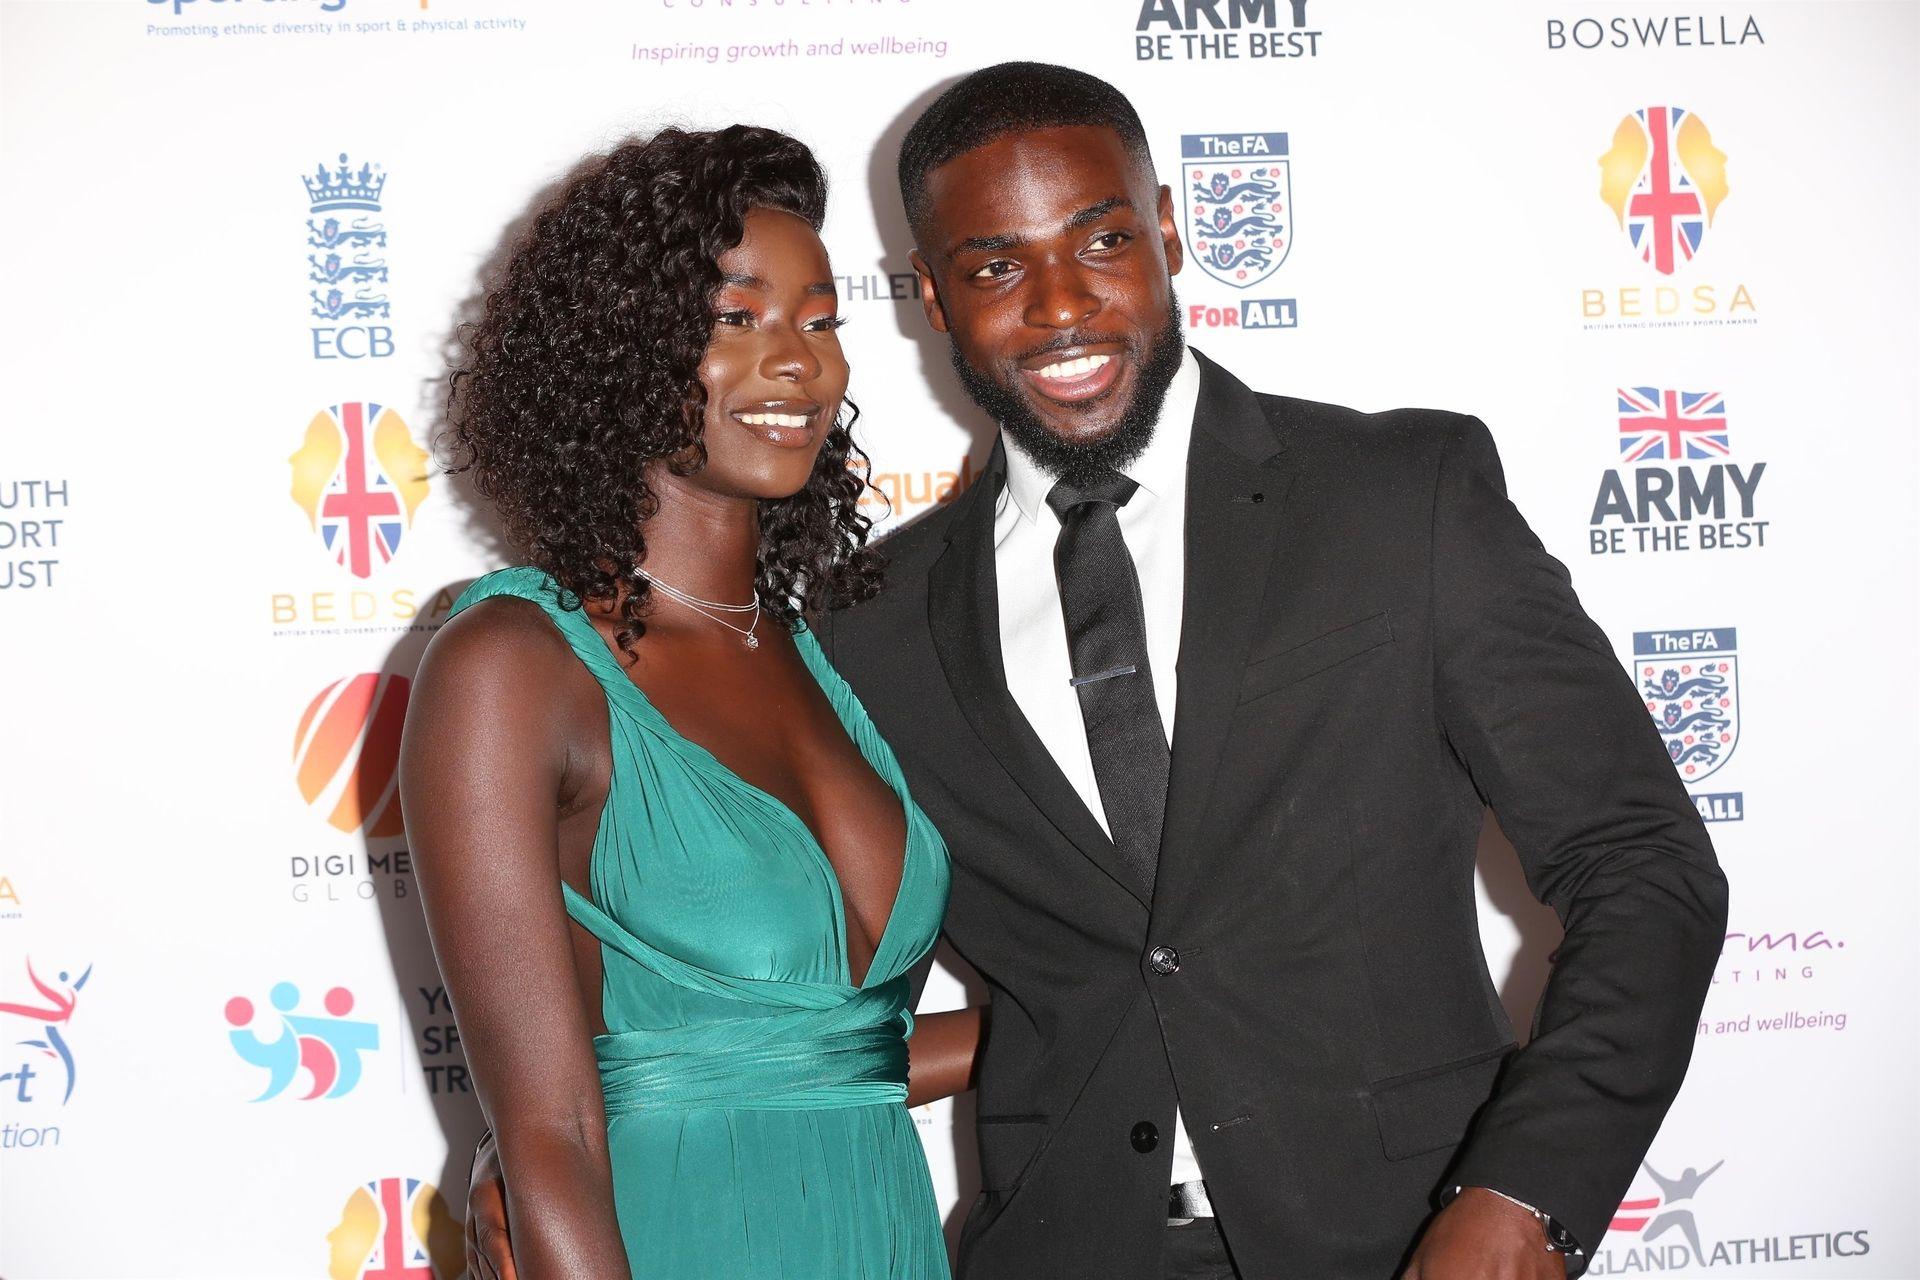 Mike Boateng & Priscilla Anyabu Are Seen At British Ethnic Diversity Sports Awards 0011